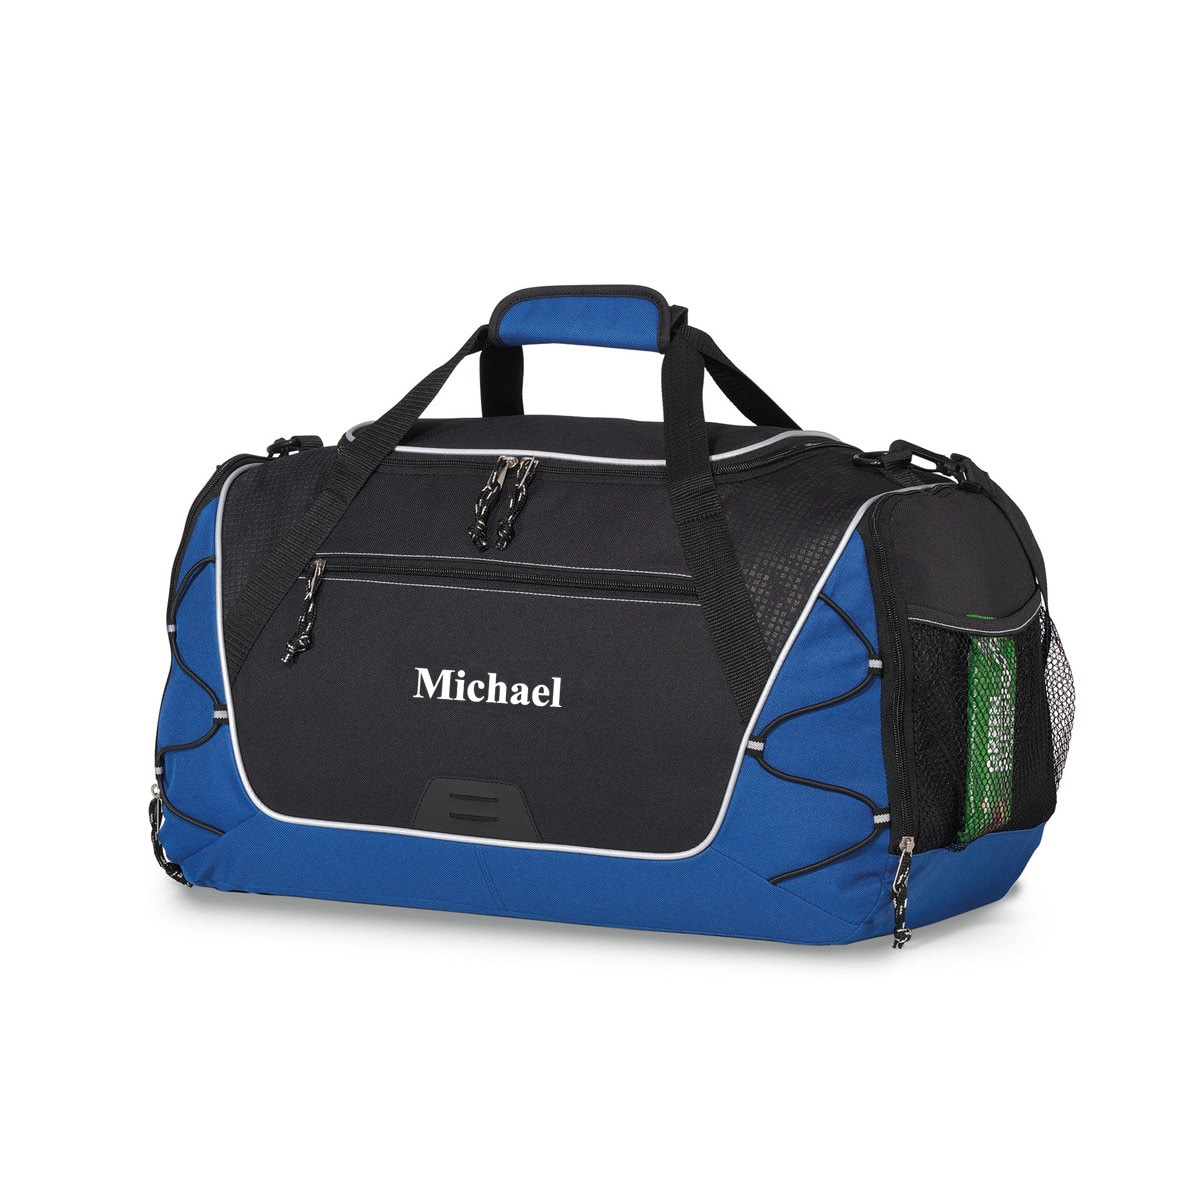 sports duffel bag personalized sports duffel bag